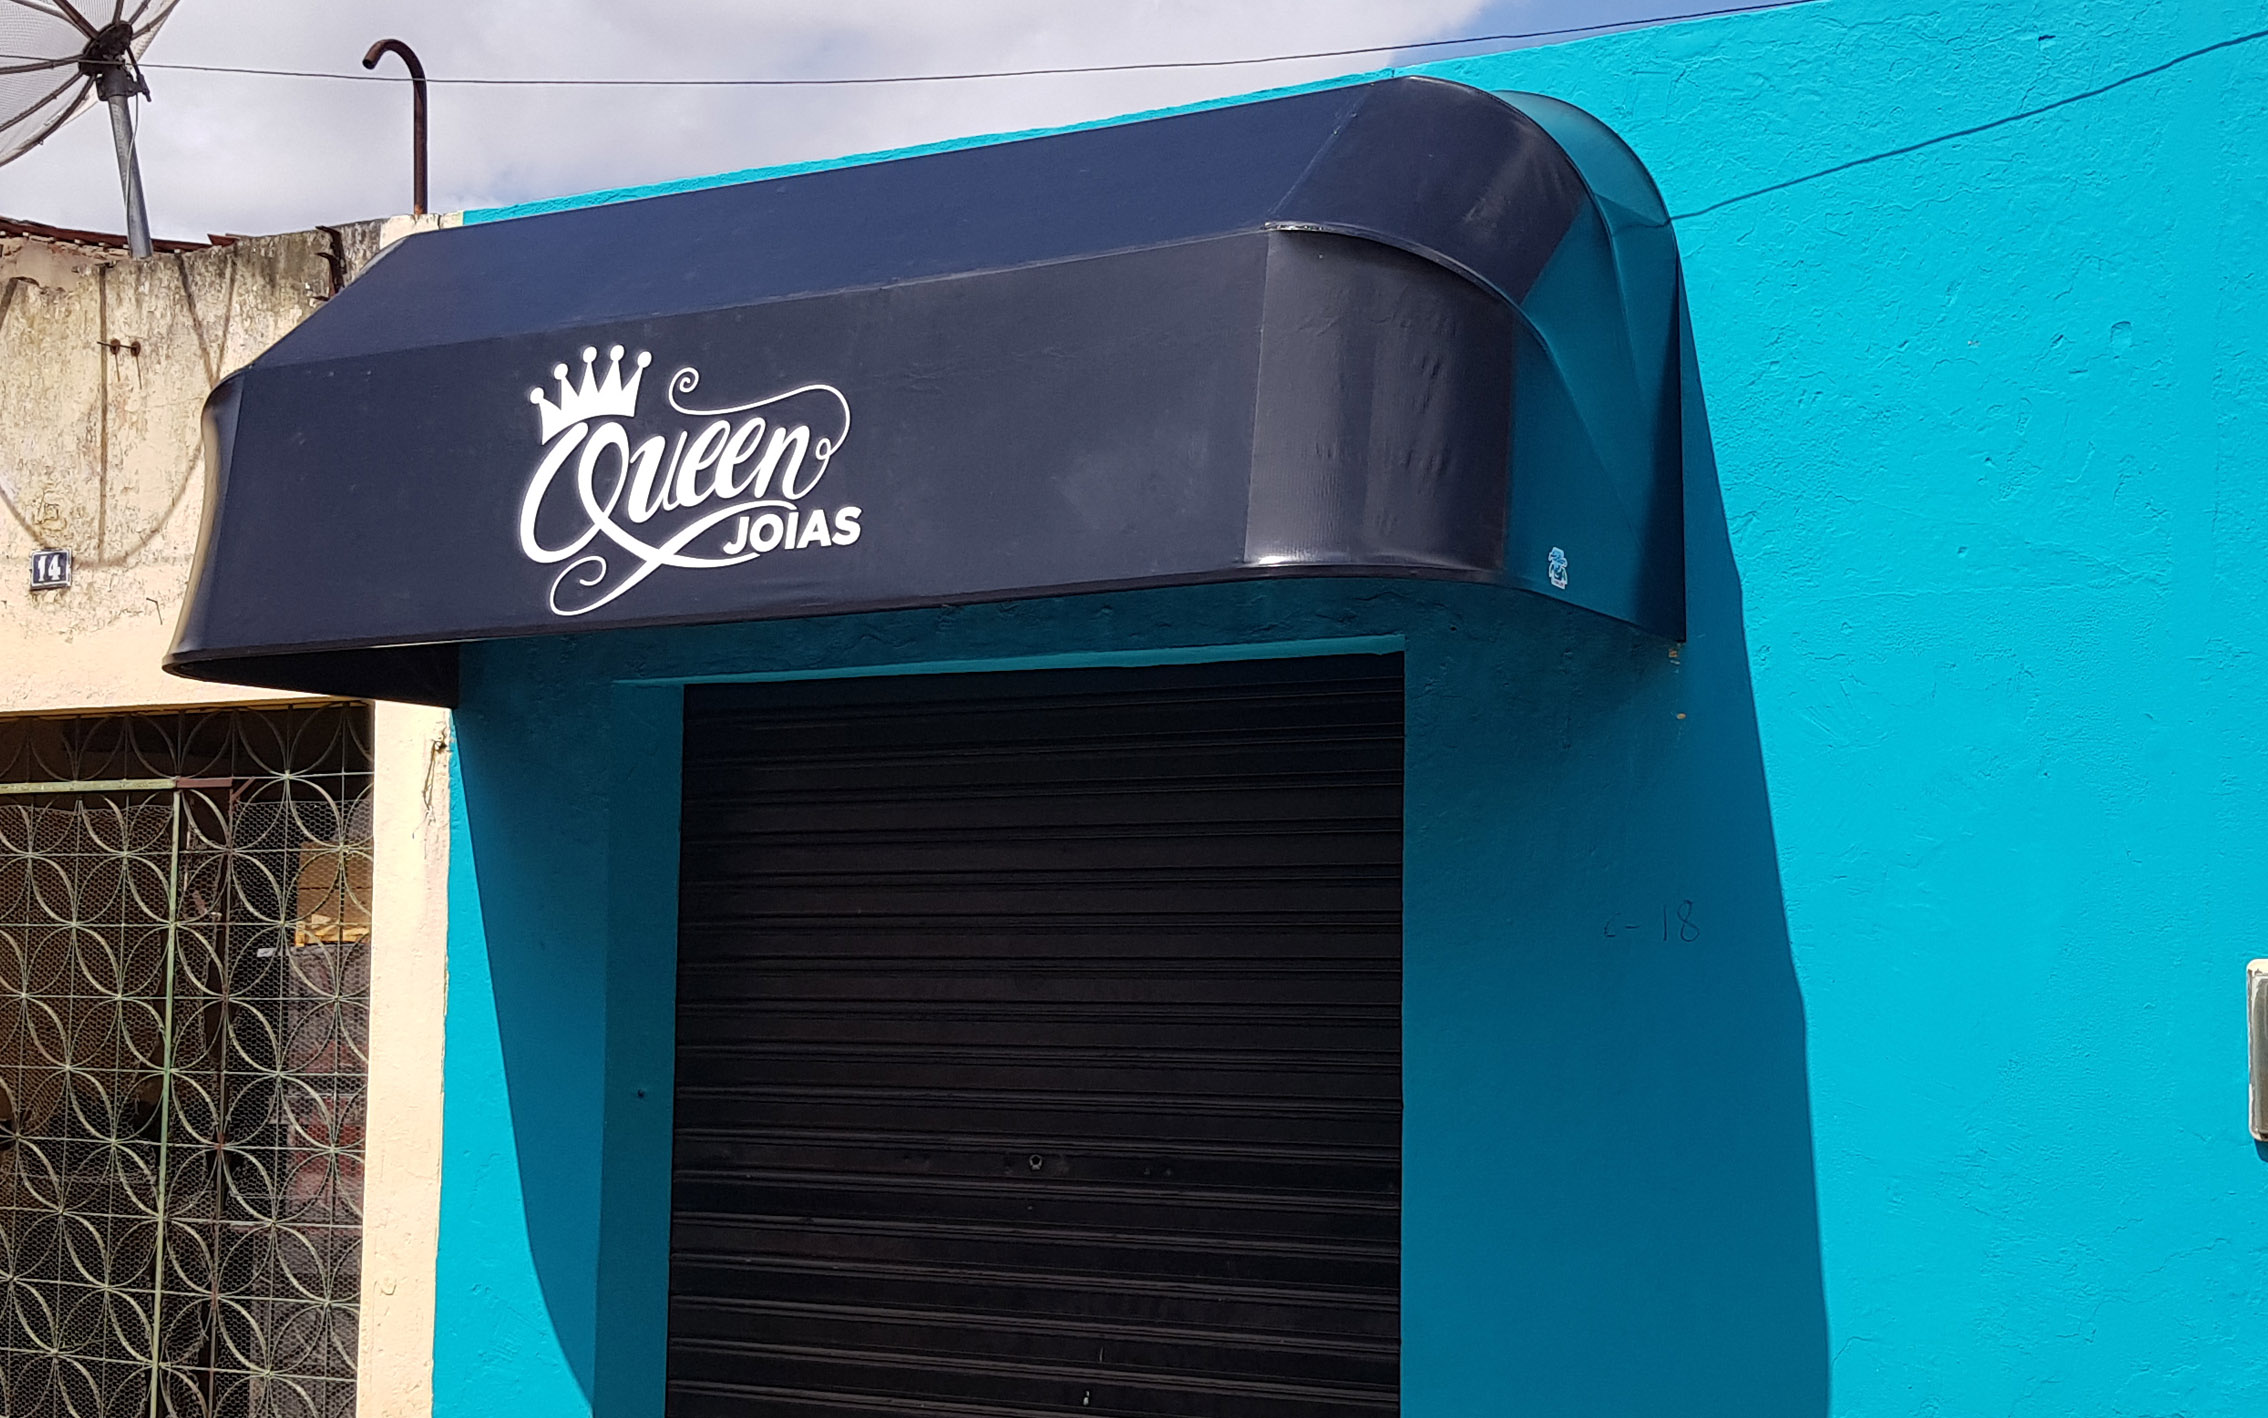 https://0201.nccdn.net/1_2/000/000/127/7ad/atelier2---toldo-queen-joias.jpg